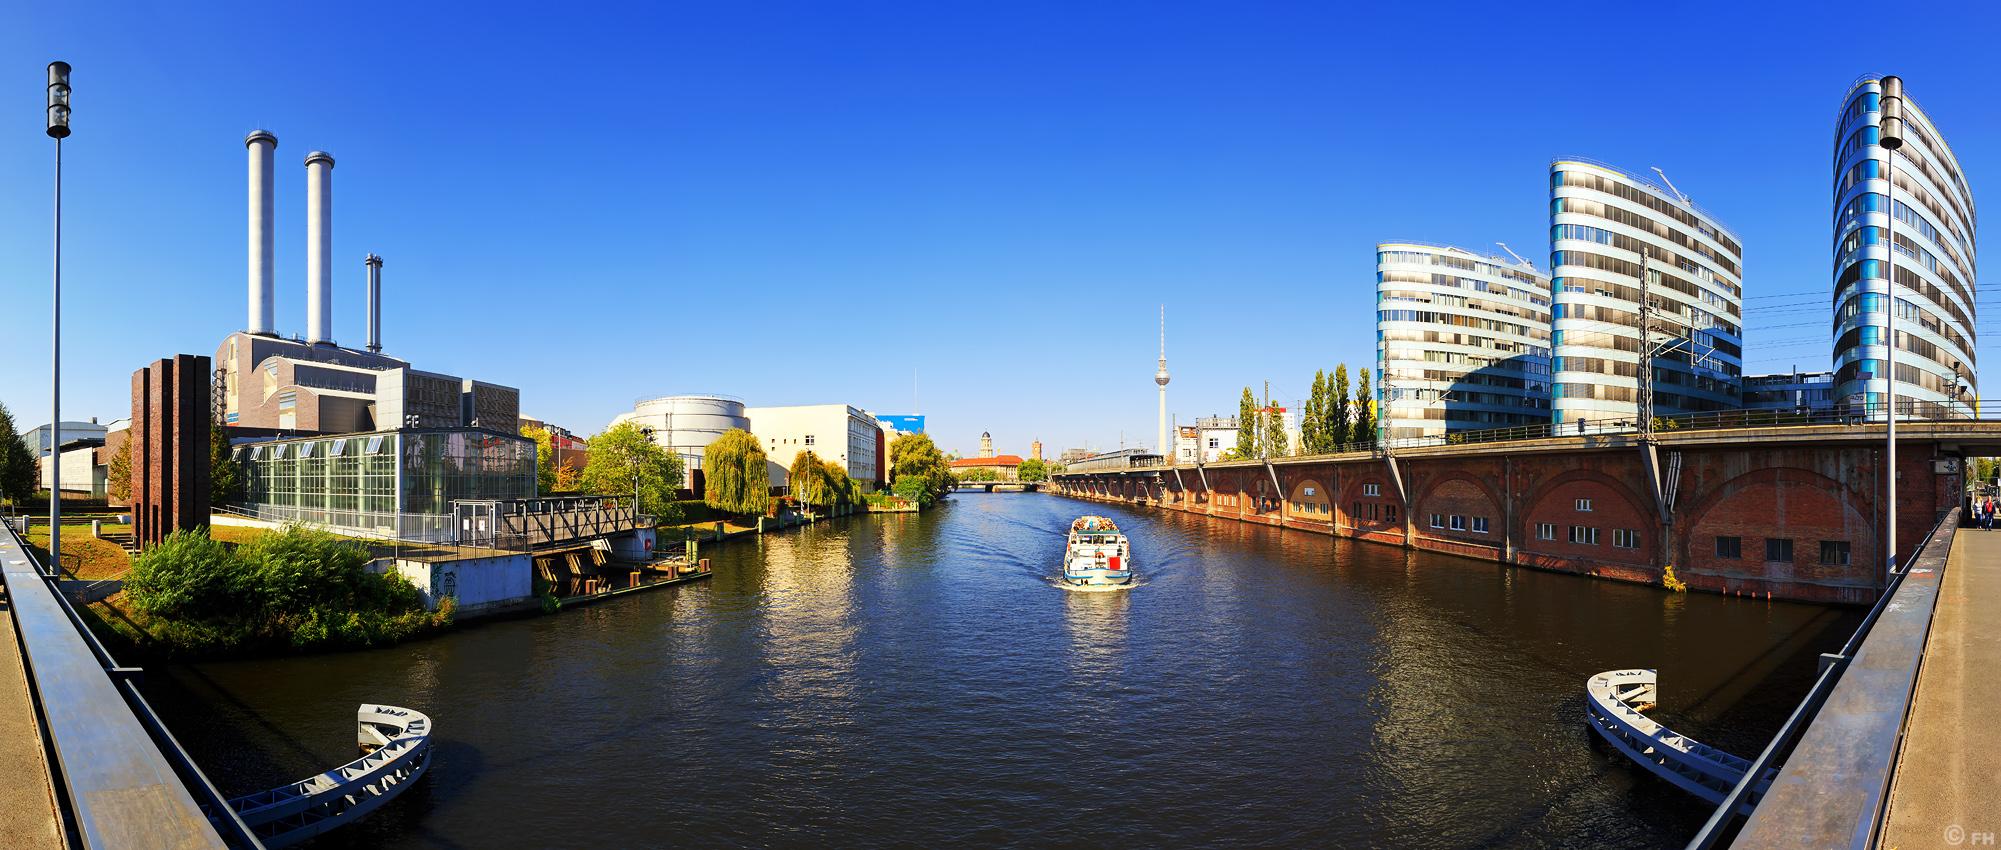 Berlin_Michaelkirchbruecke_Pano_2A_k